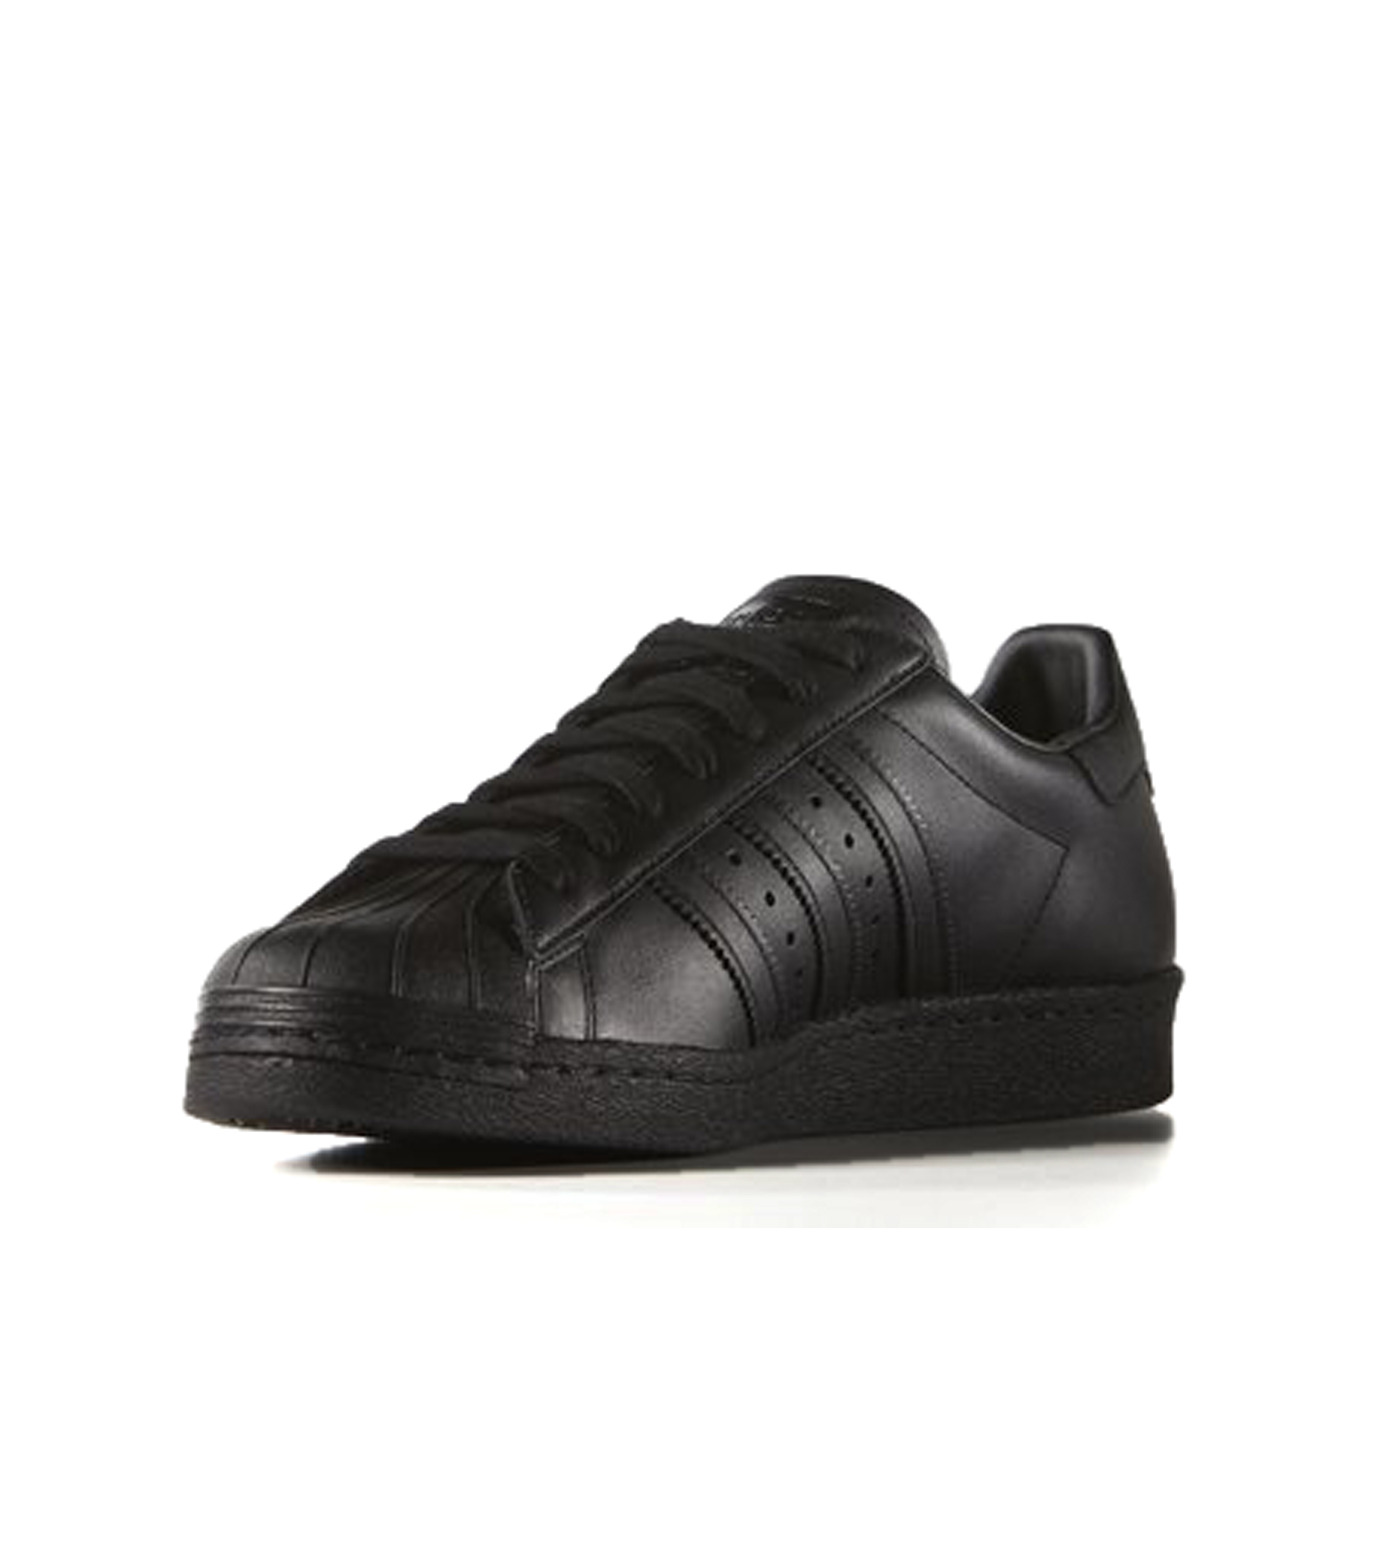 adidas(アディダス)のSUPERSTAR 80s-BLACK(シューズ/shoes)-S79442-13 拡大詳細画像4